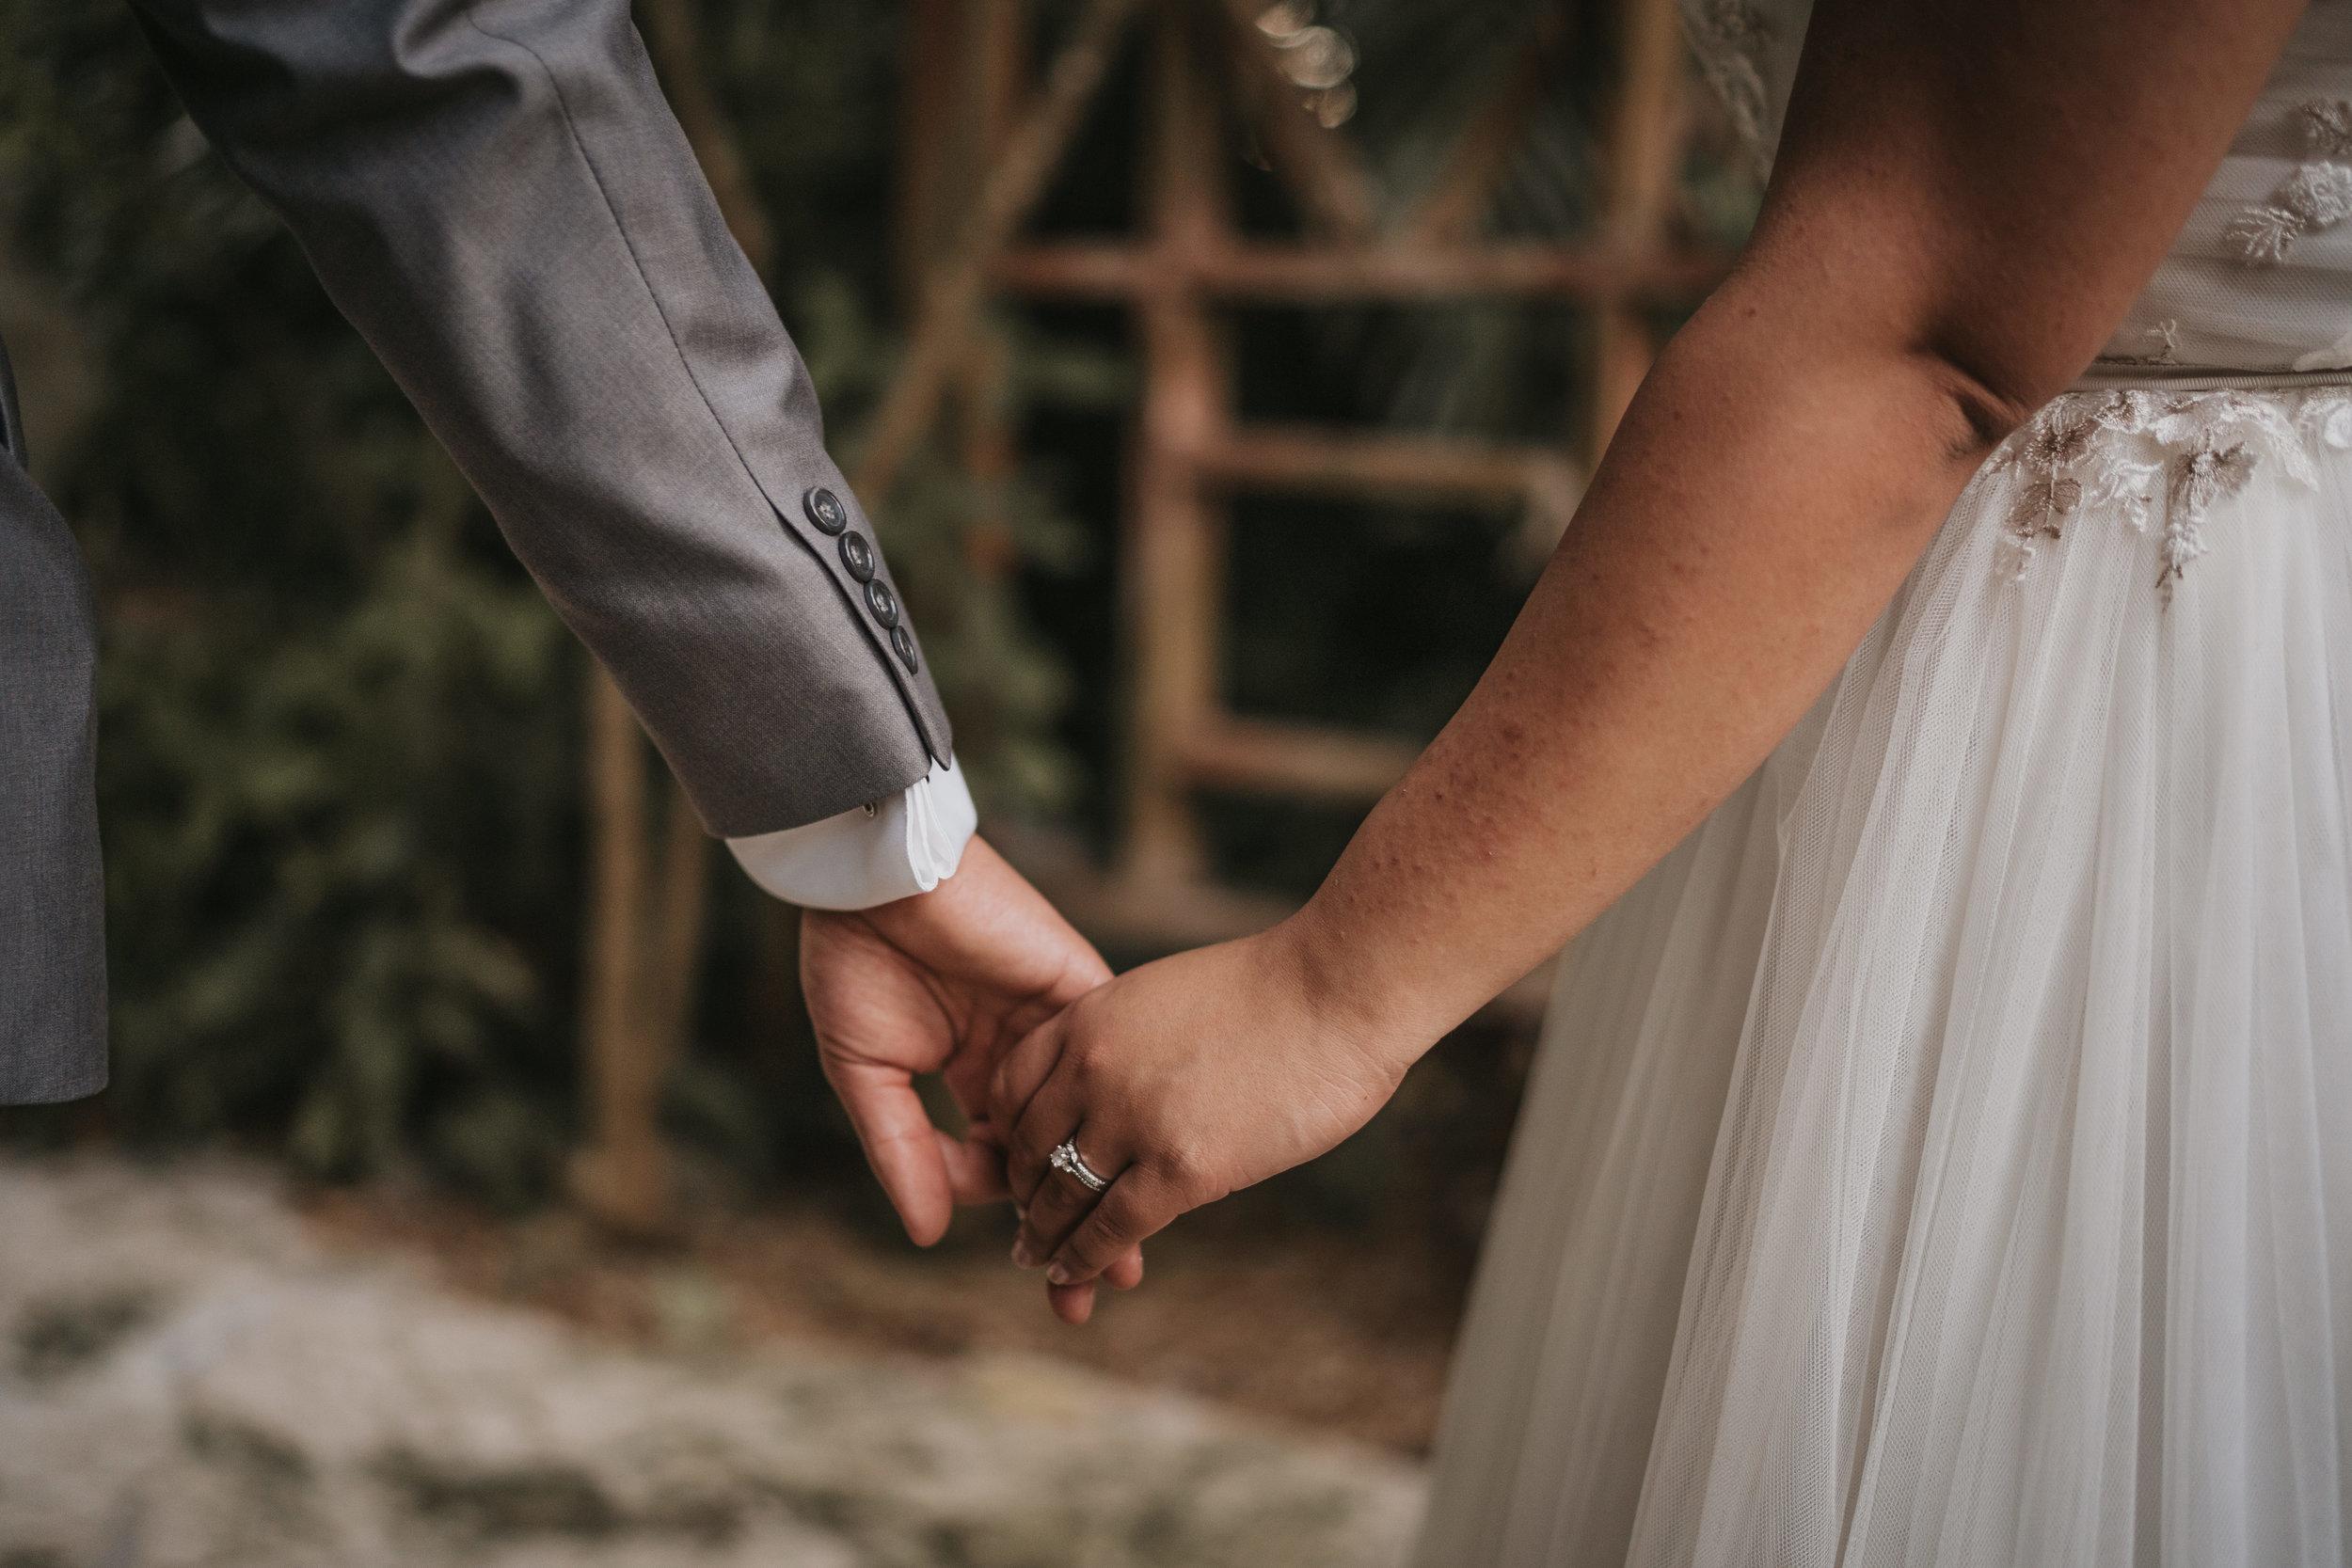 370MICHI&GABEWEDDINGDAY(WeddingFinal).jpg